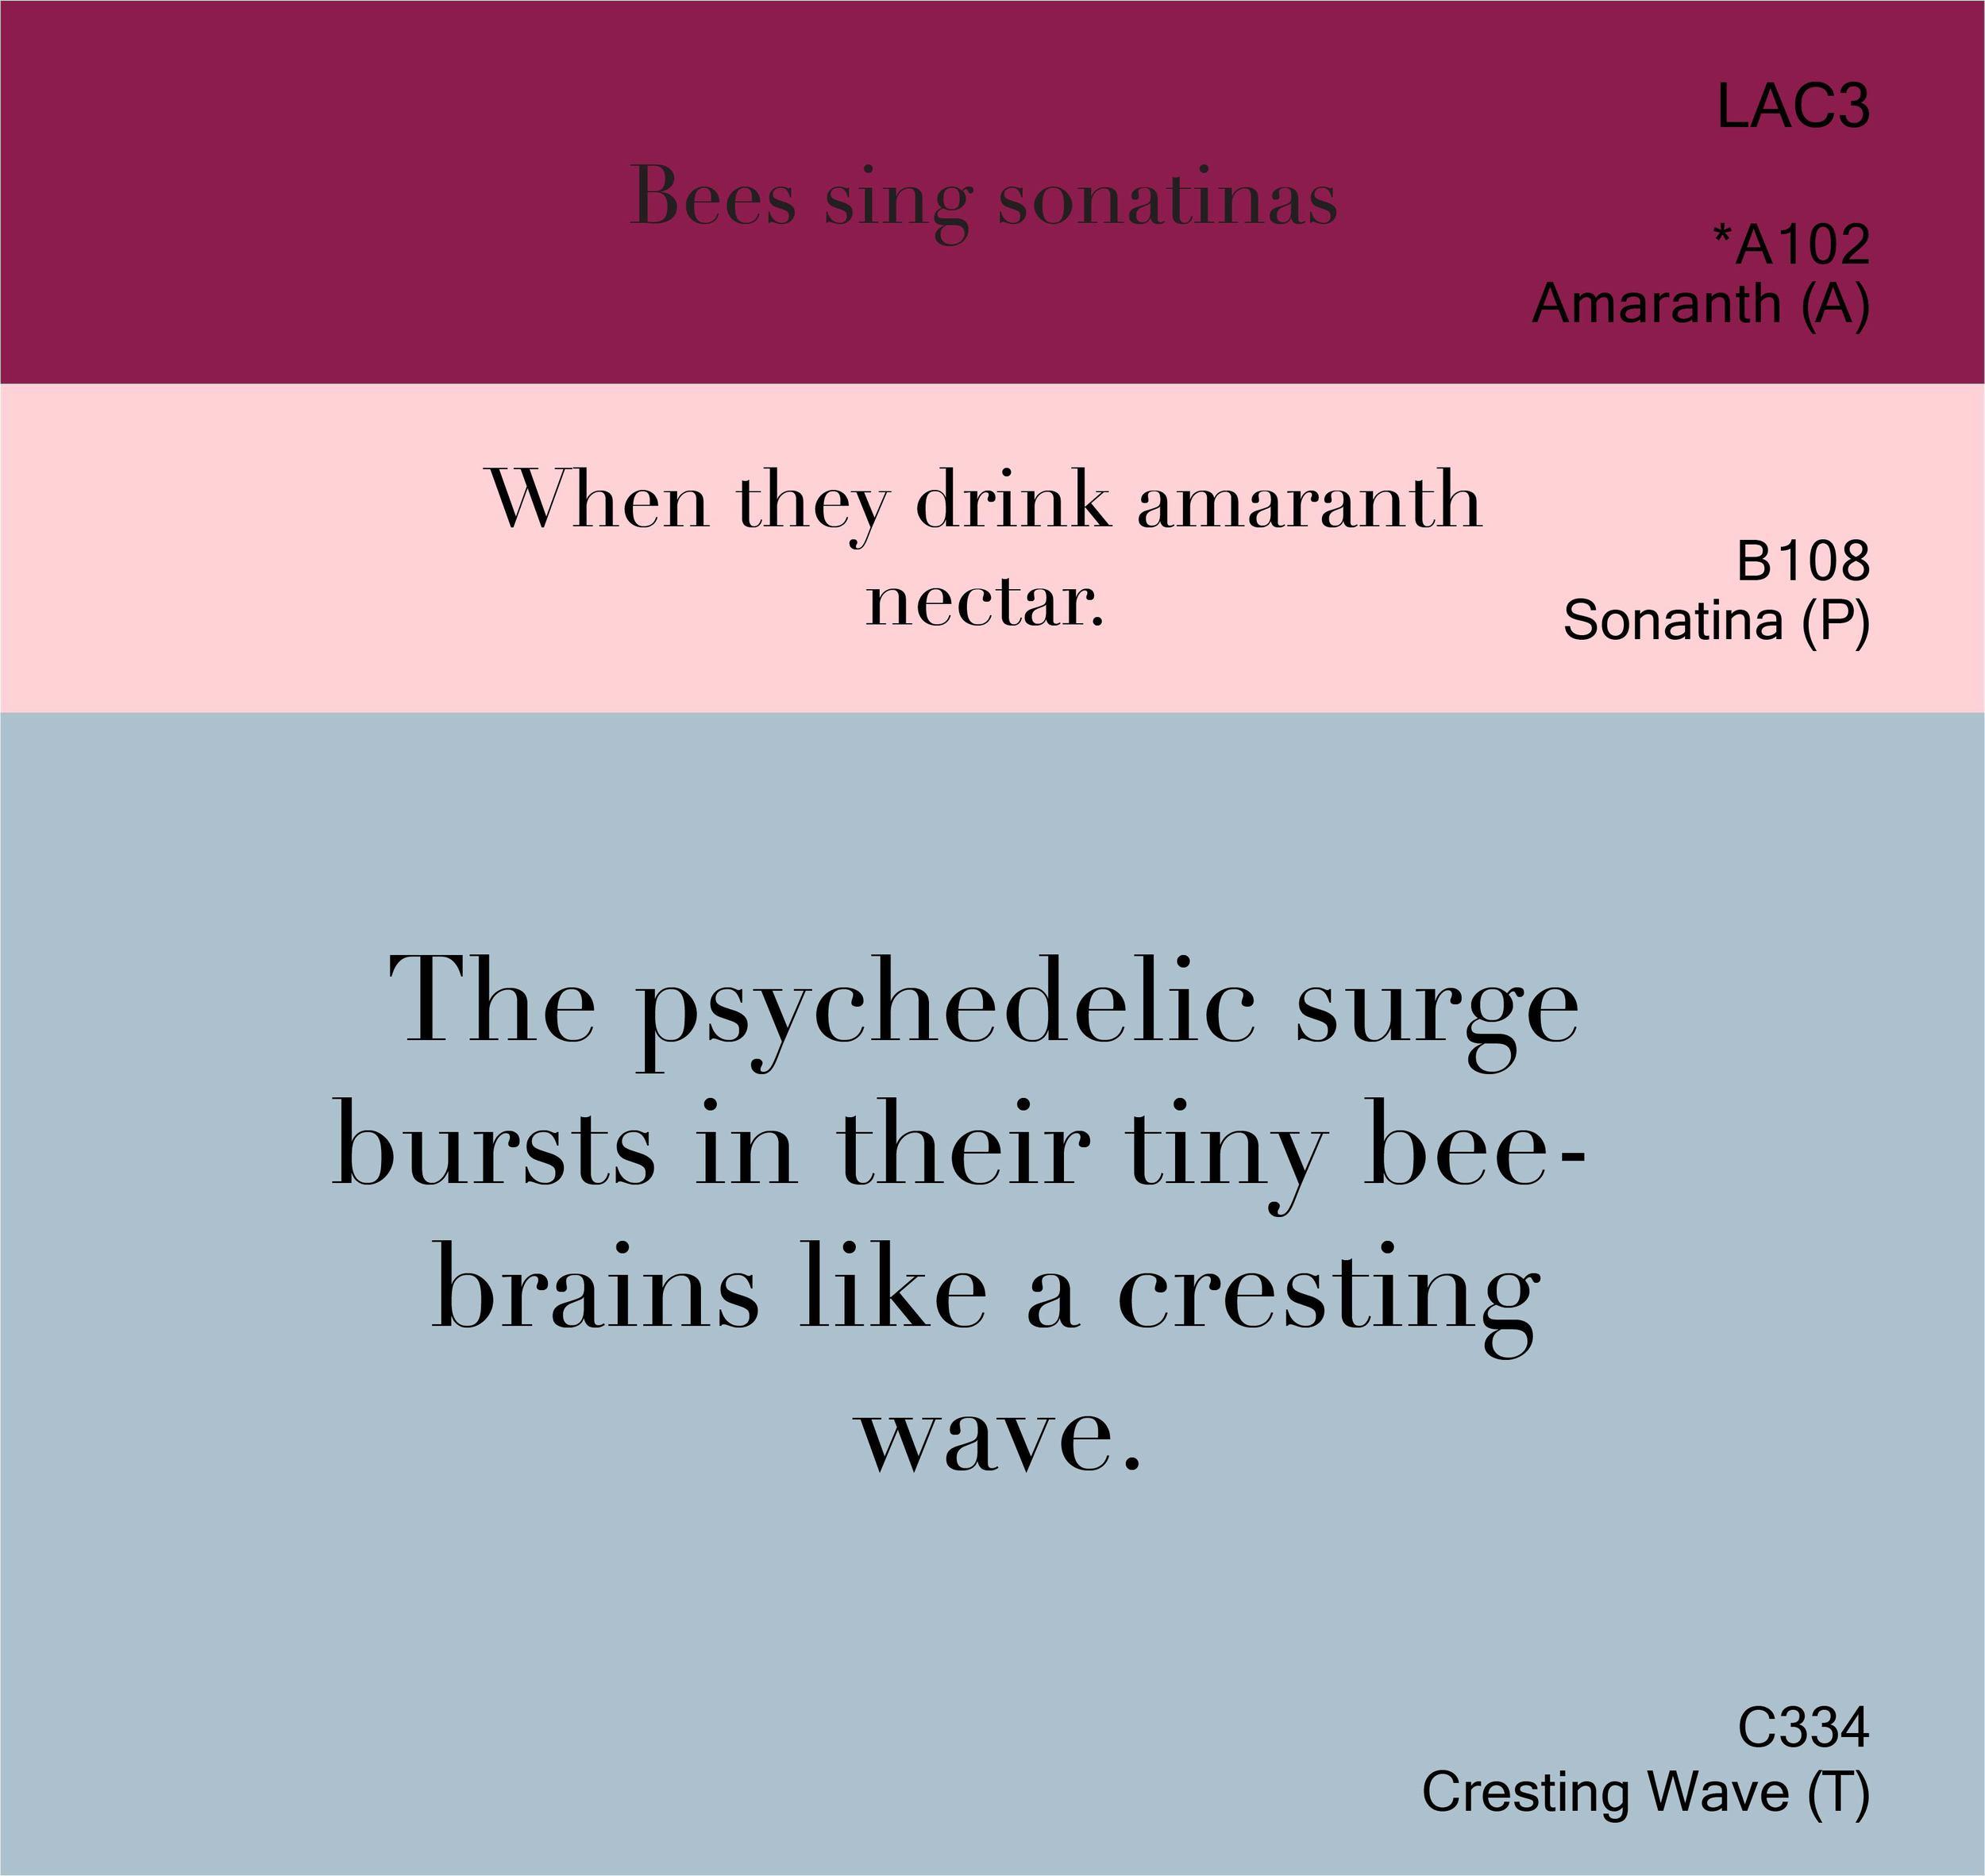 Amaranth, Sonatina, Cresting Wave III